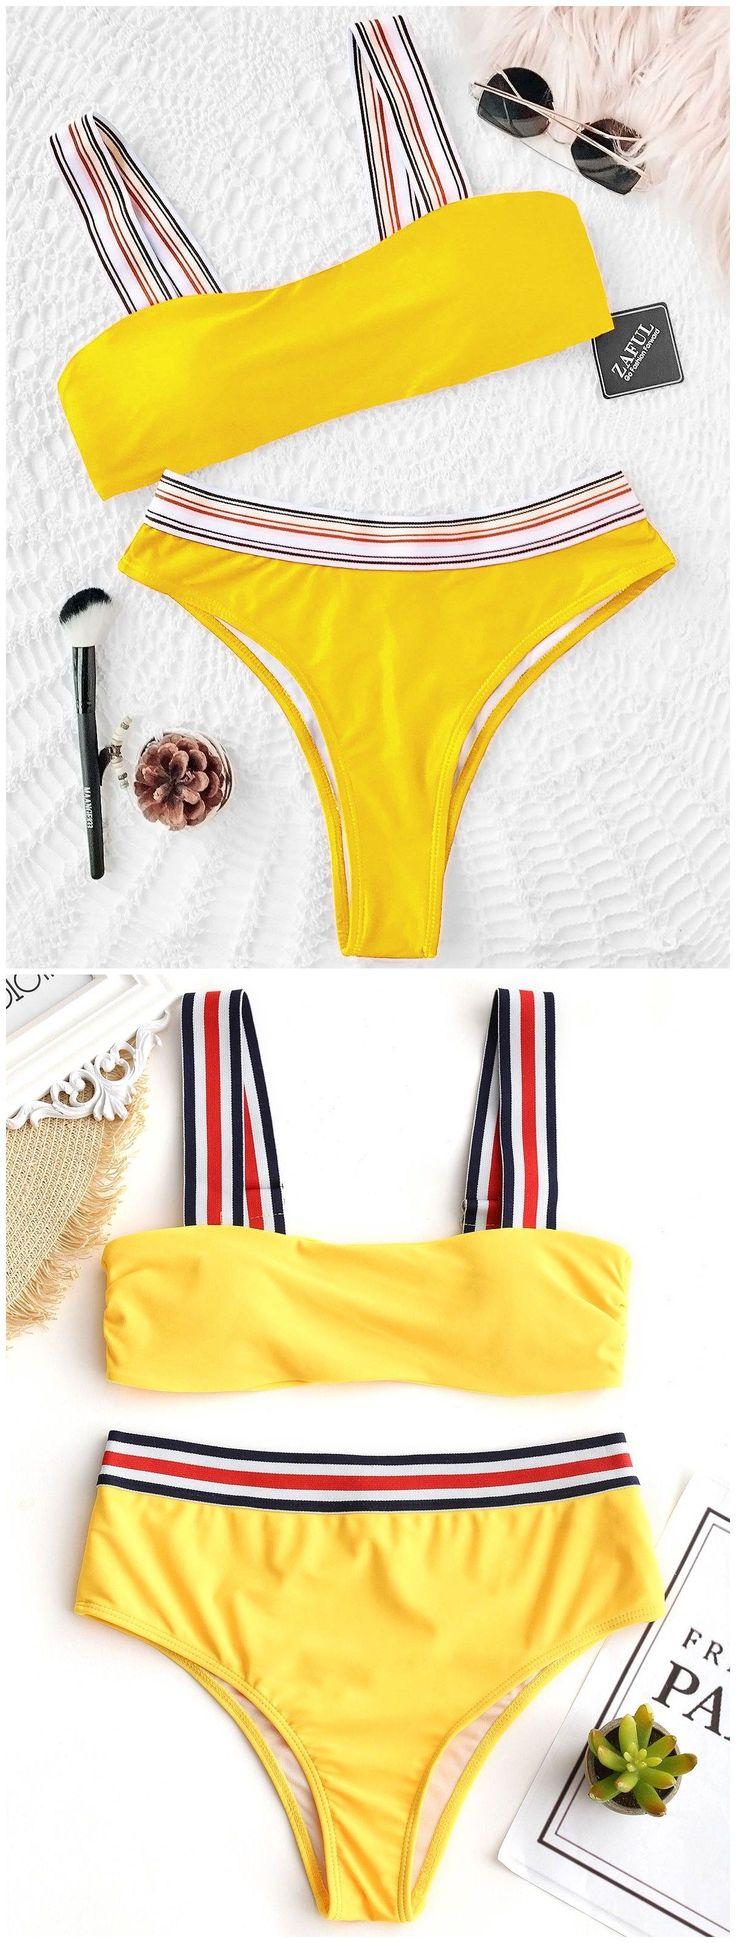 Up to 80% OFF! Striped Trim Padded Bikini Set. #Zaful #Swimwear #Bikinis zaful,zaful outfits,zaful dresses,spring outfits,summer dresses,Valentine's Day,valentines day ideas,cute,casual,fashion,style,bathing suit,swimsuits,one pieces,swimwear,bikini set,bikini,one piece swimwear,beach outfit,swimwear cover ups,high waisted swimsuit,tankini,high cut one piece swimsuit,high waisted swimsuit,swimwear modest,swimsuit modest,cover ups,swimsuit cover up @zaful Extra 10% OFF Code:ZF2017 #CoverUps